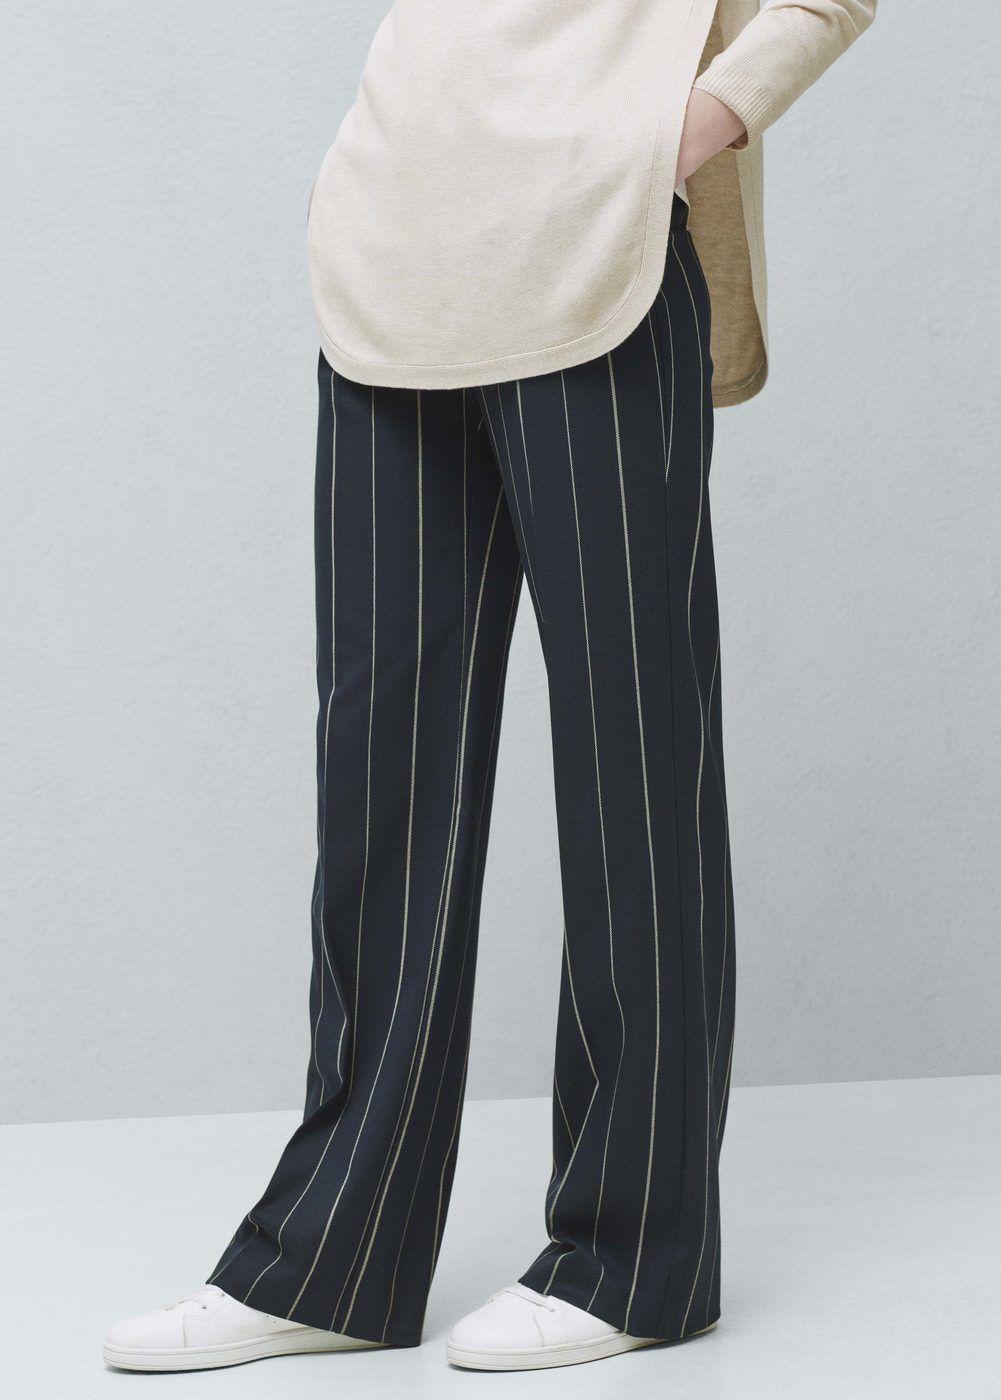 eef43677a27f Pantalon droit à rayures - Femme. Straight striped trousers